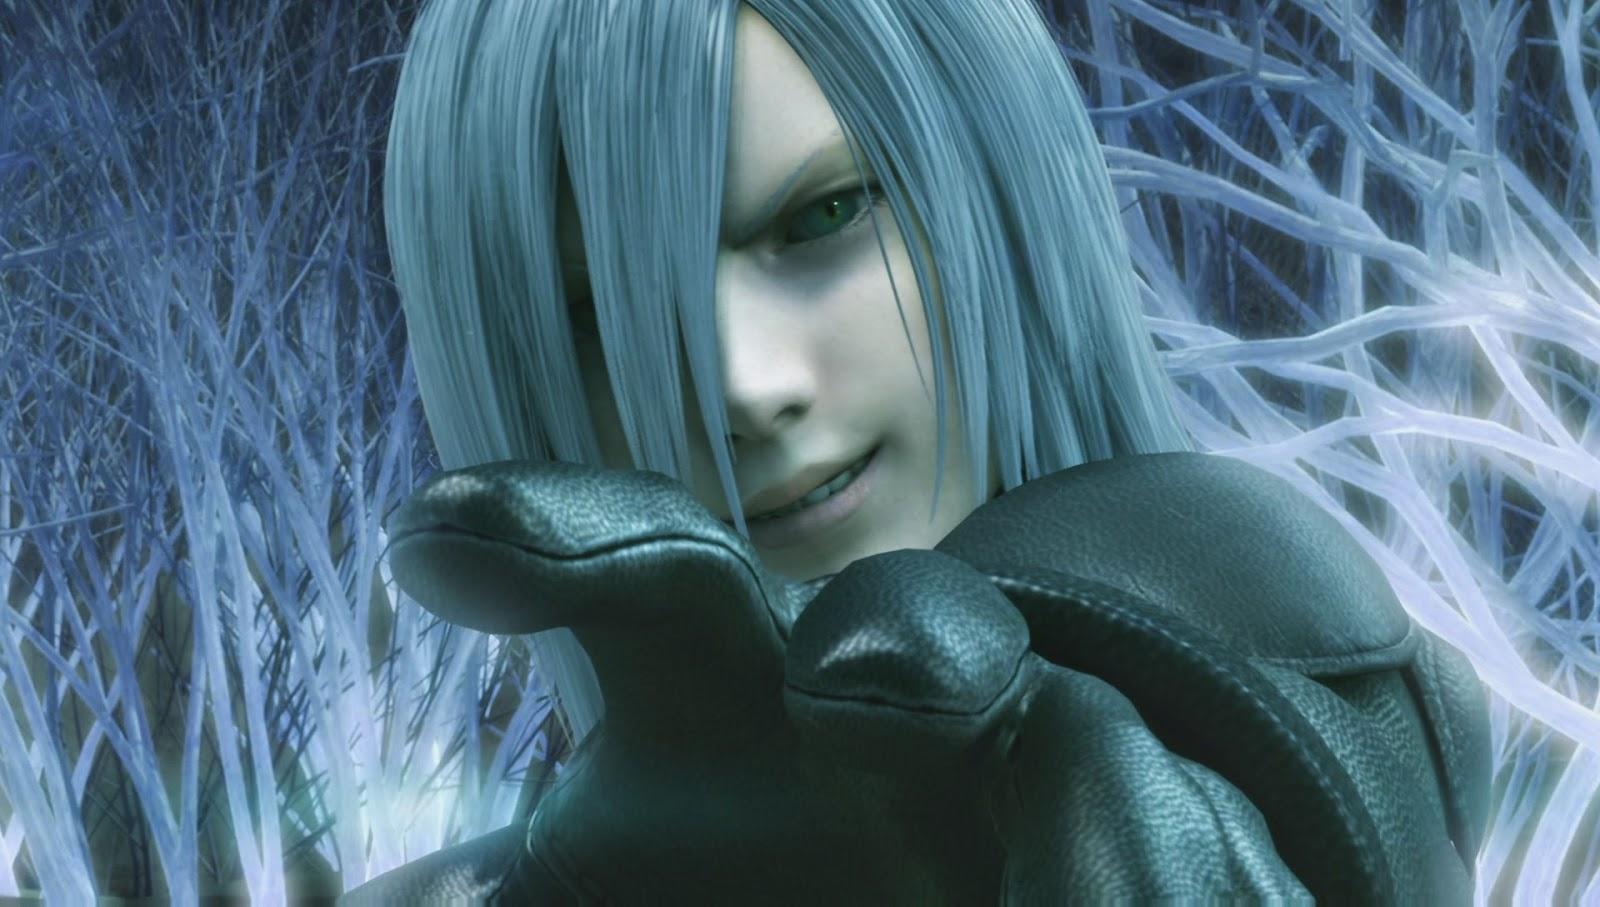 Ảnh trong phim Final Fantasy VII: Những Đứa Con Số Phận - Final Fantasy VII: Advent Children 4